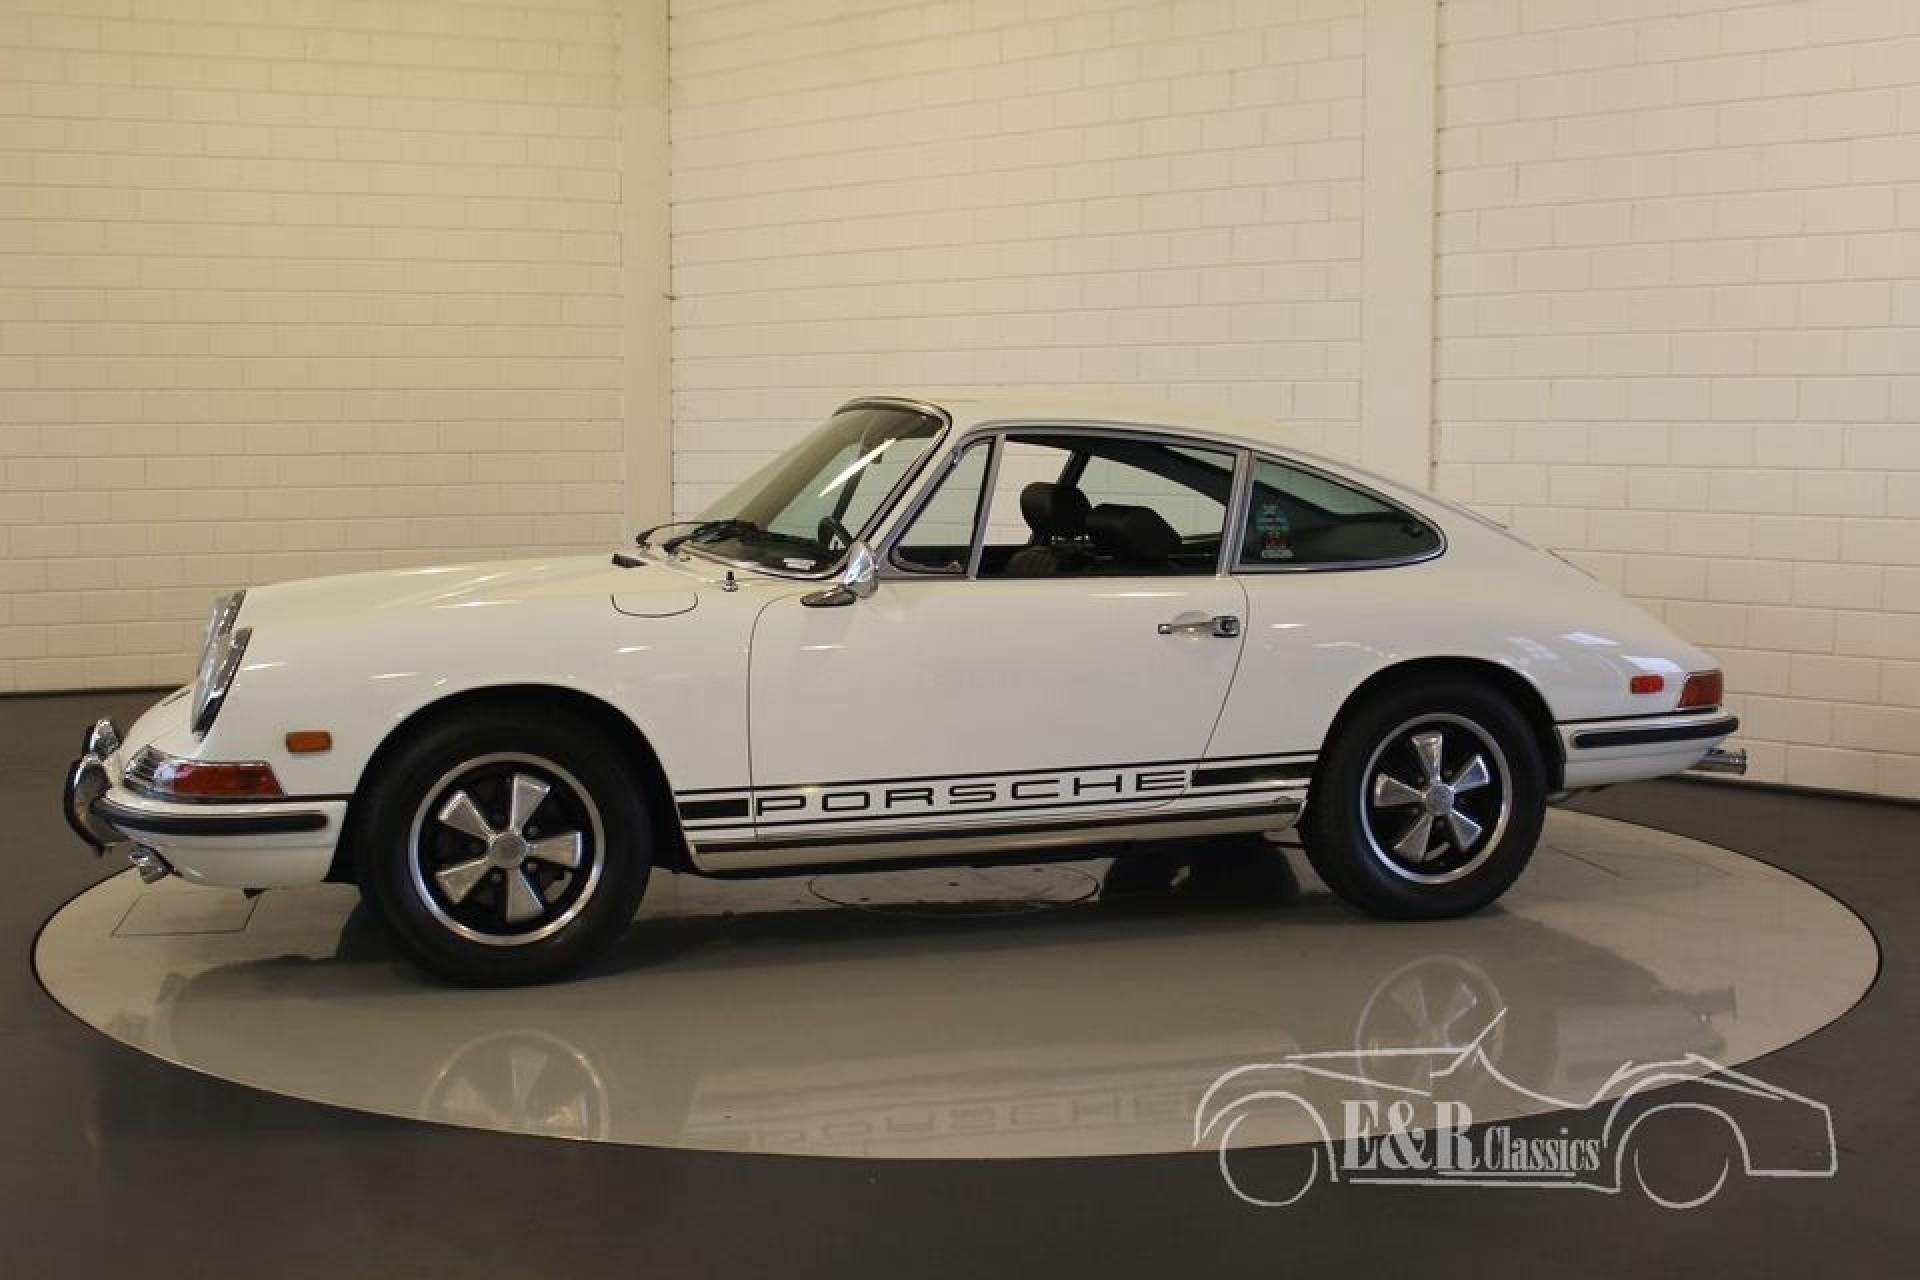 porsche 911 l coupe blanc 1968 vendre erclassics. Black Bedroom Furniture Sets. Home Design Ideas